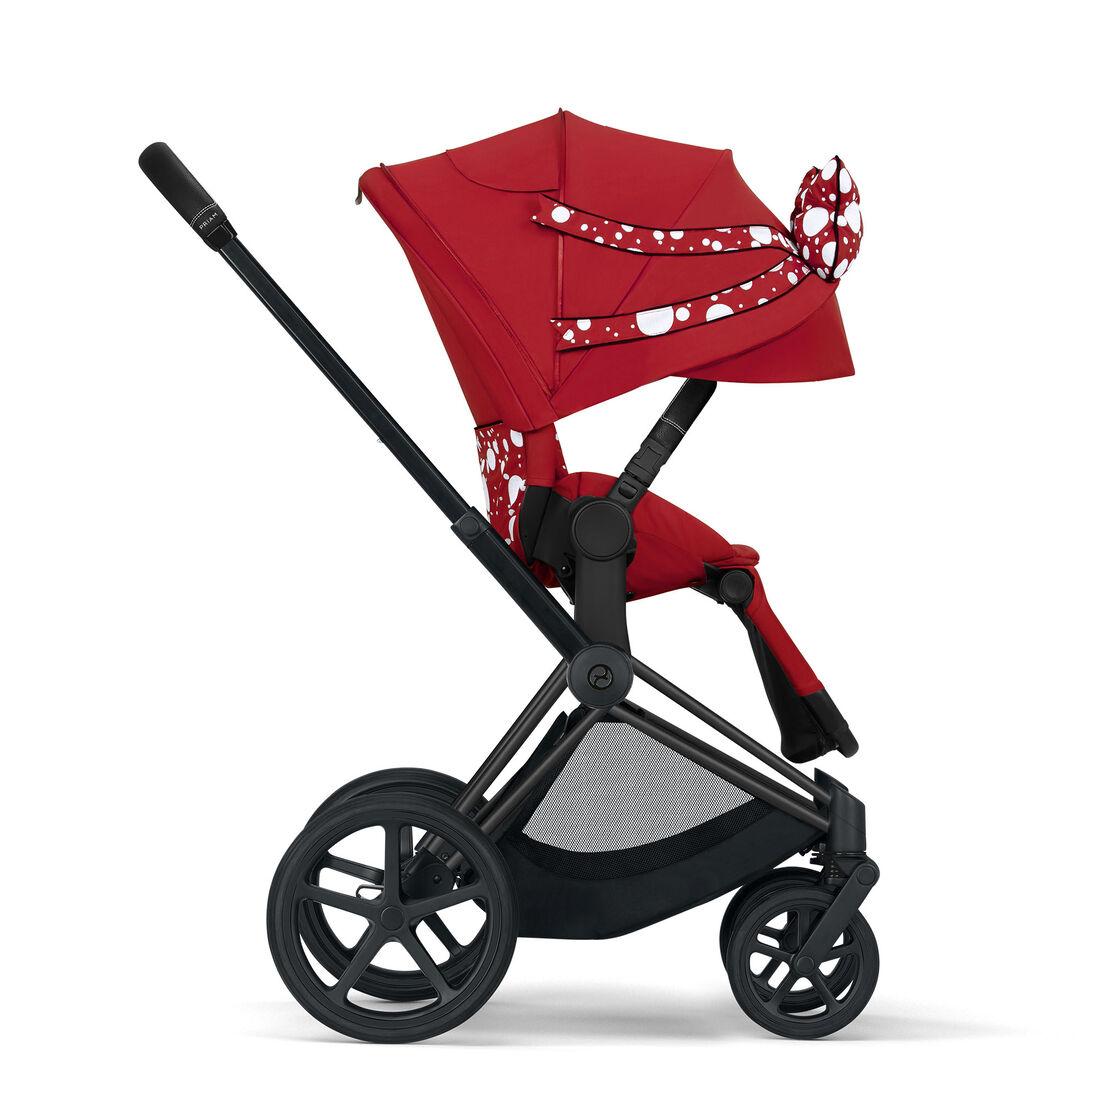 CYBEX Priam Sitzpaket - Petticoat Red in Petticoat Red large Bild 4